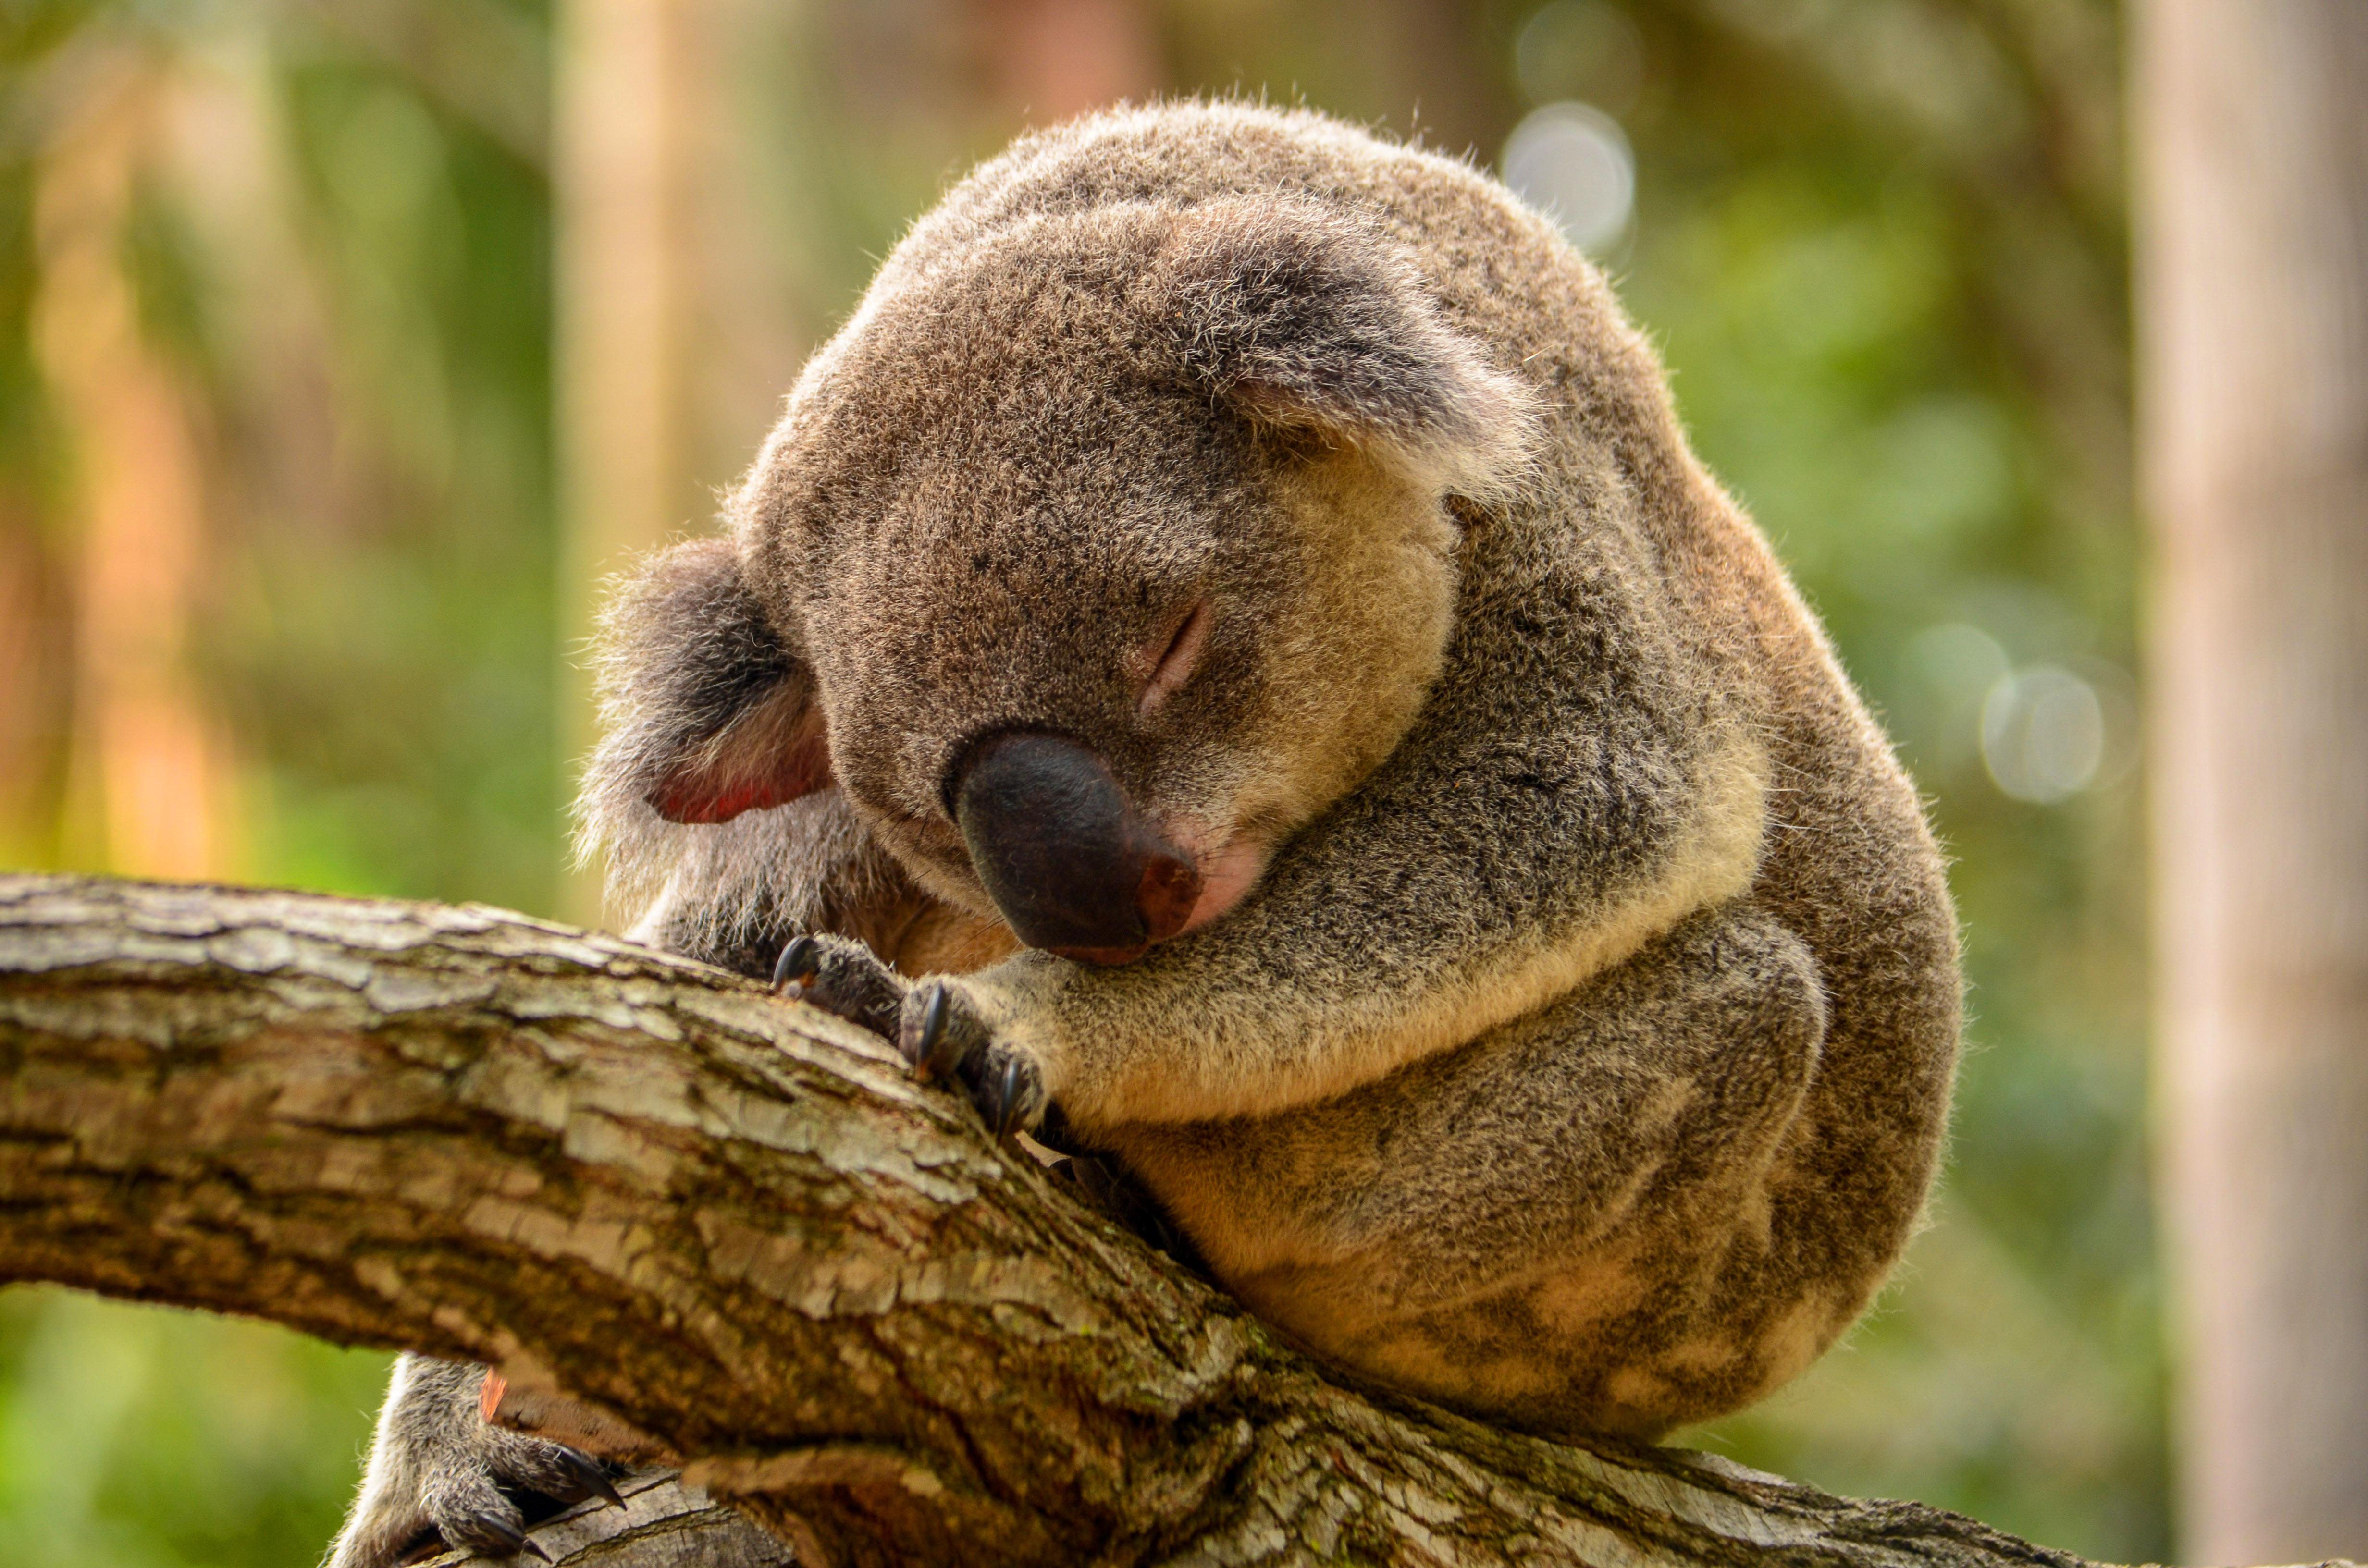 koala wallpaper iphone